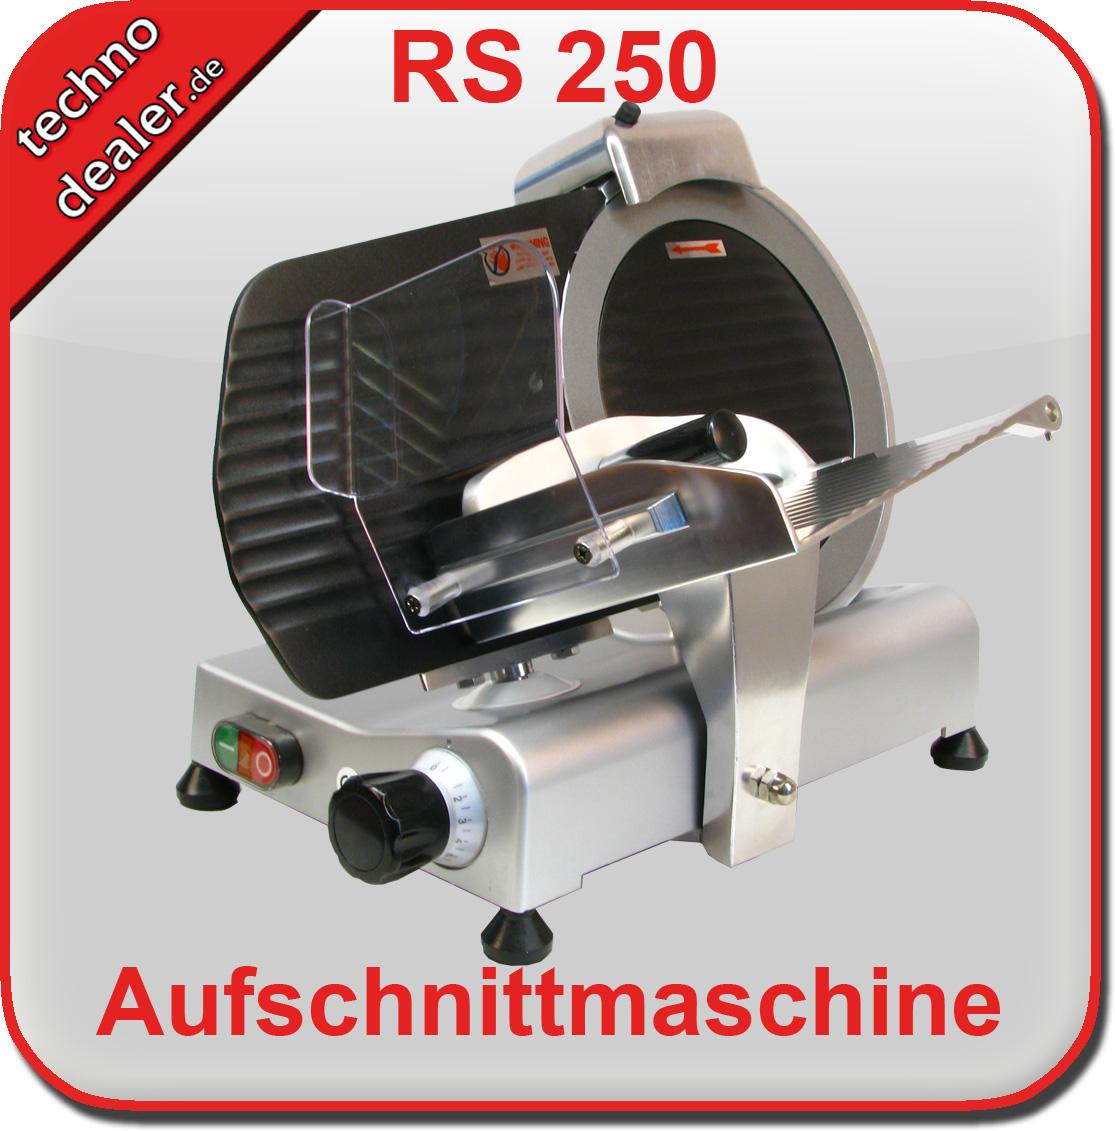 Aufschnittmaschine RS 250 teflon